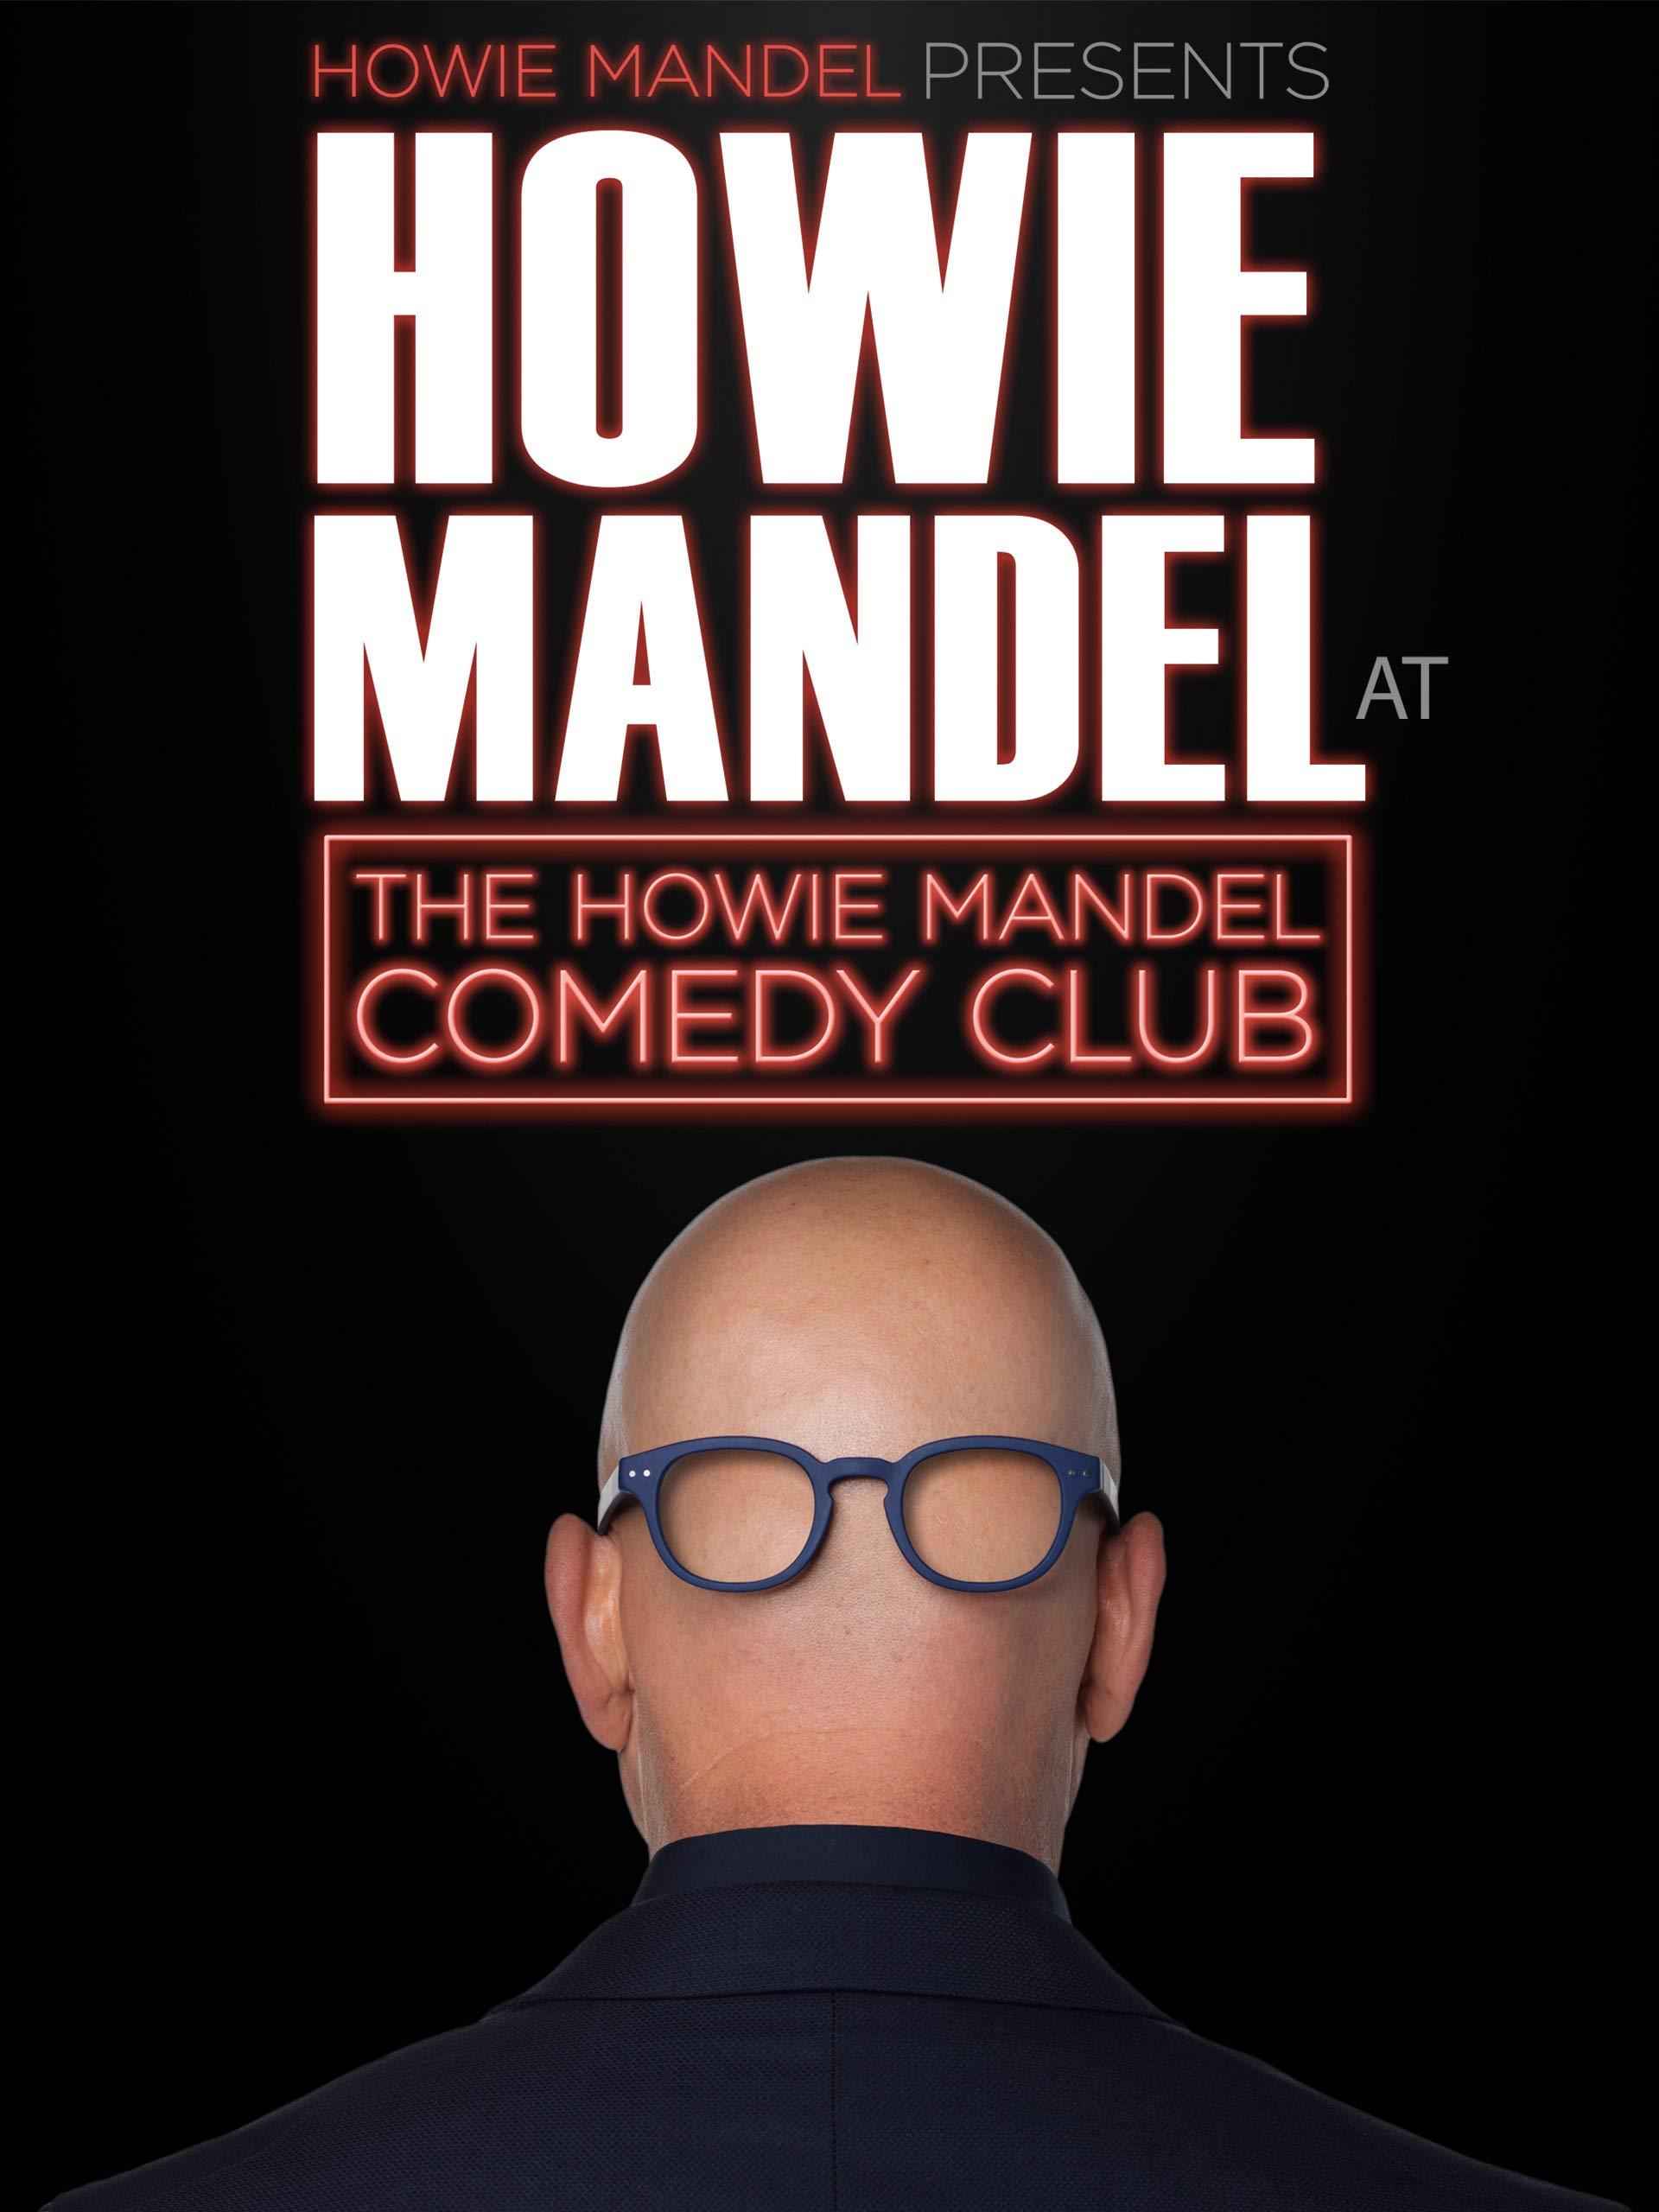 Howie Mandel Presents: Howie Mandel at the Howie Mandel Comedy Club on Amazon Prime Video UK